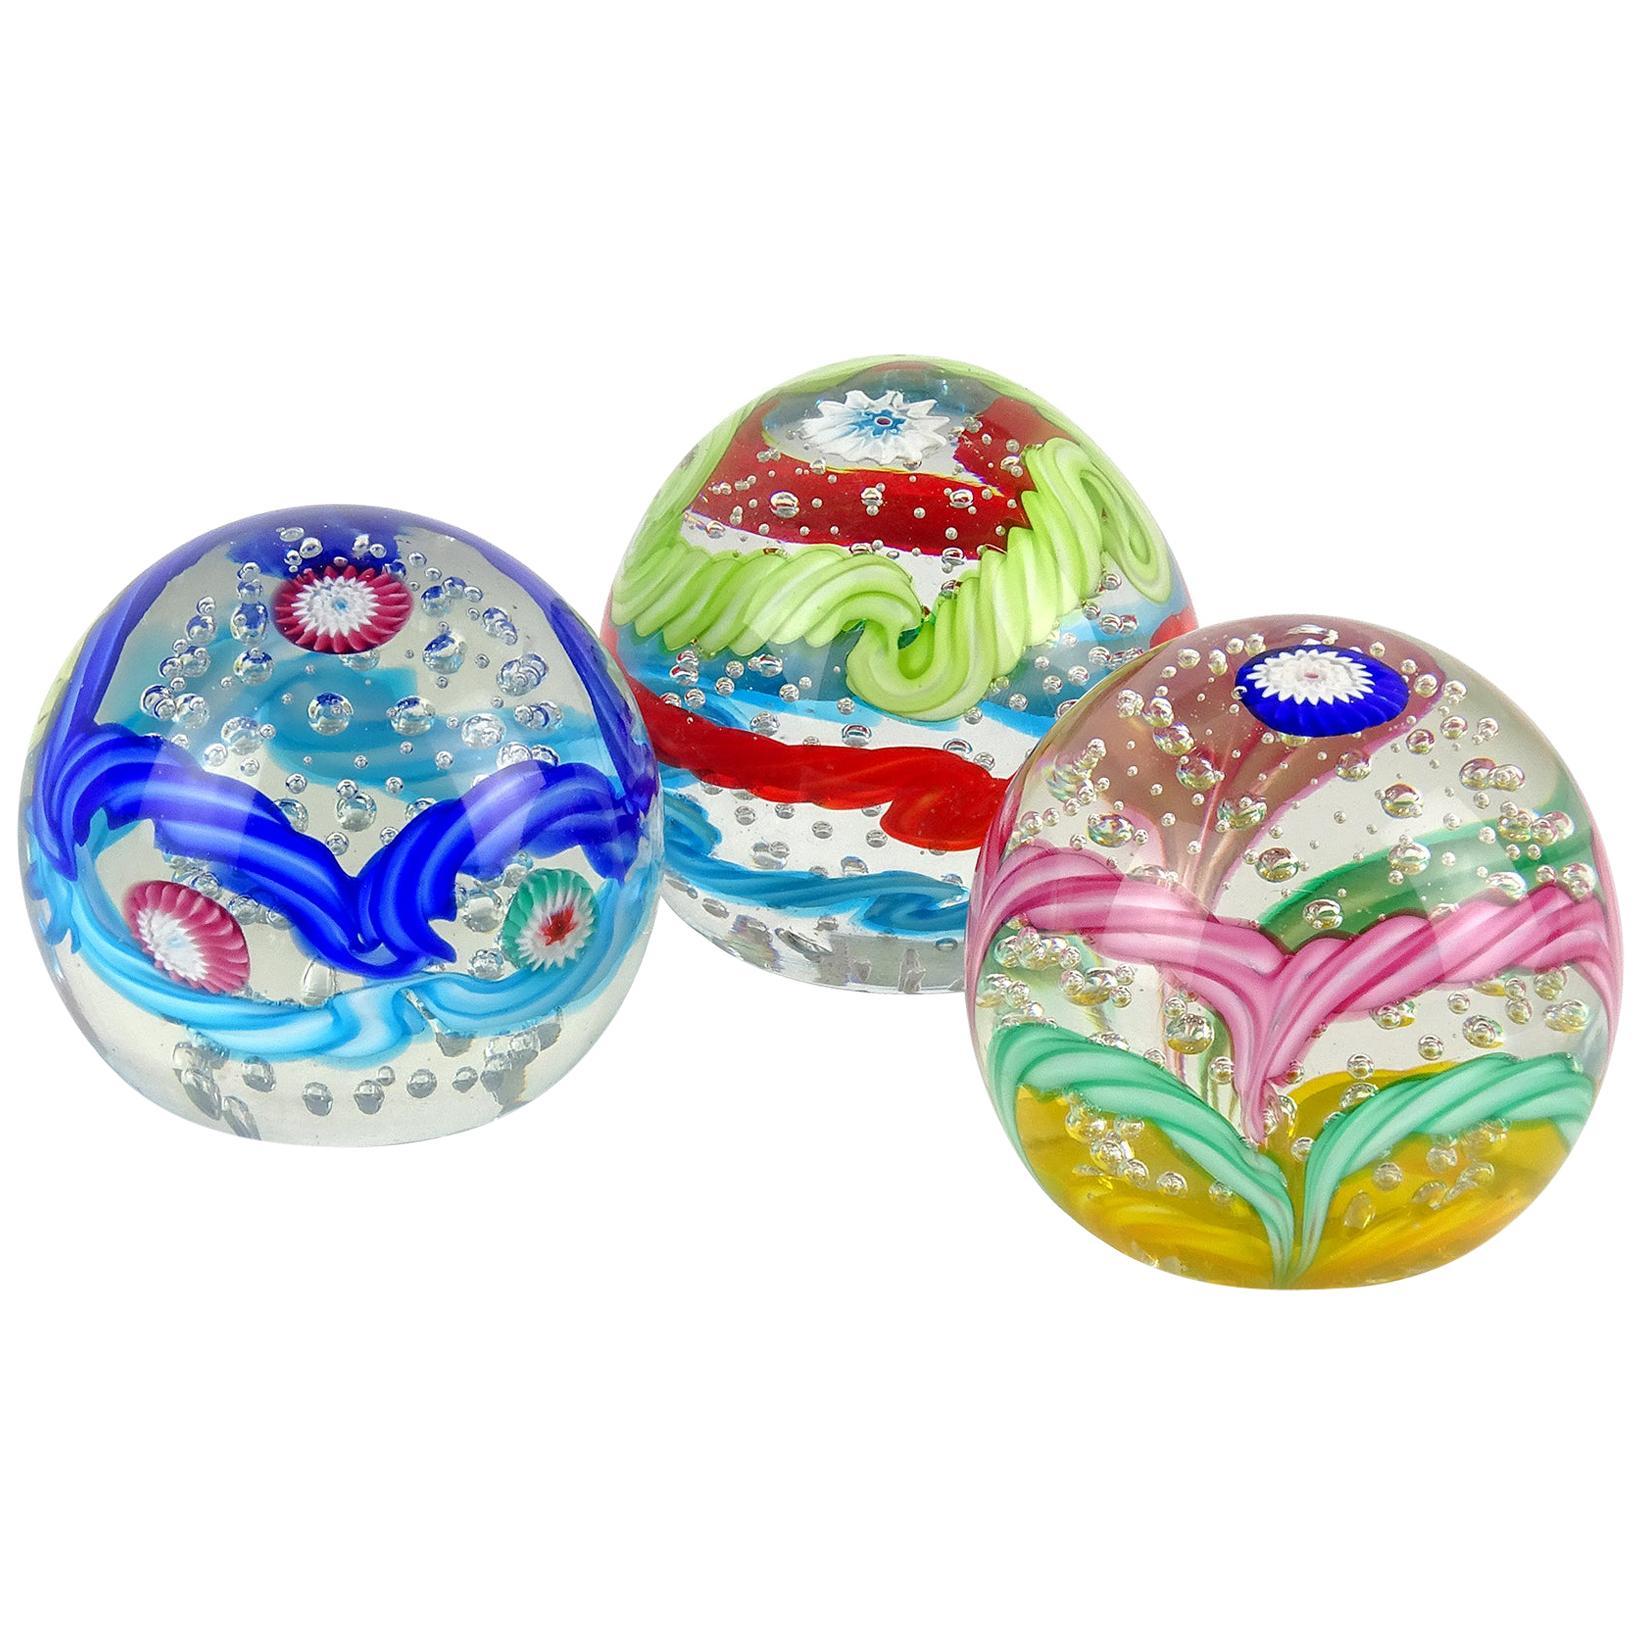 Fratelli Toso Murano Colorful Millefiori Ribbon Italian Art Glass Paperweights